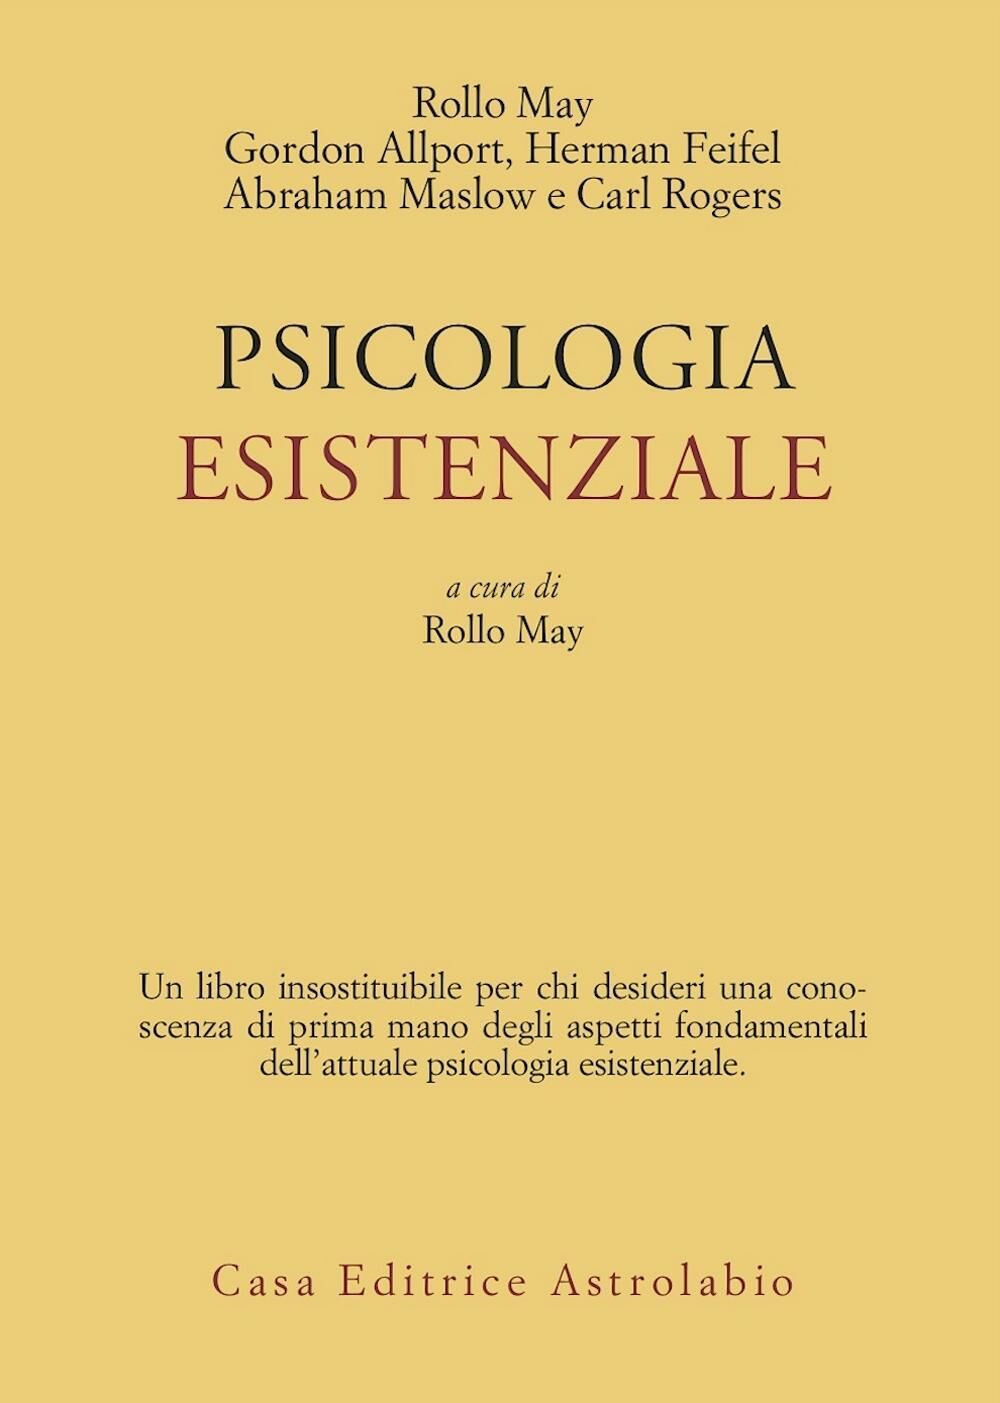 Psicologia esistenziale. Saggi di G. Allport, H. Feifel, A. Maslow, C. Rogers